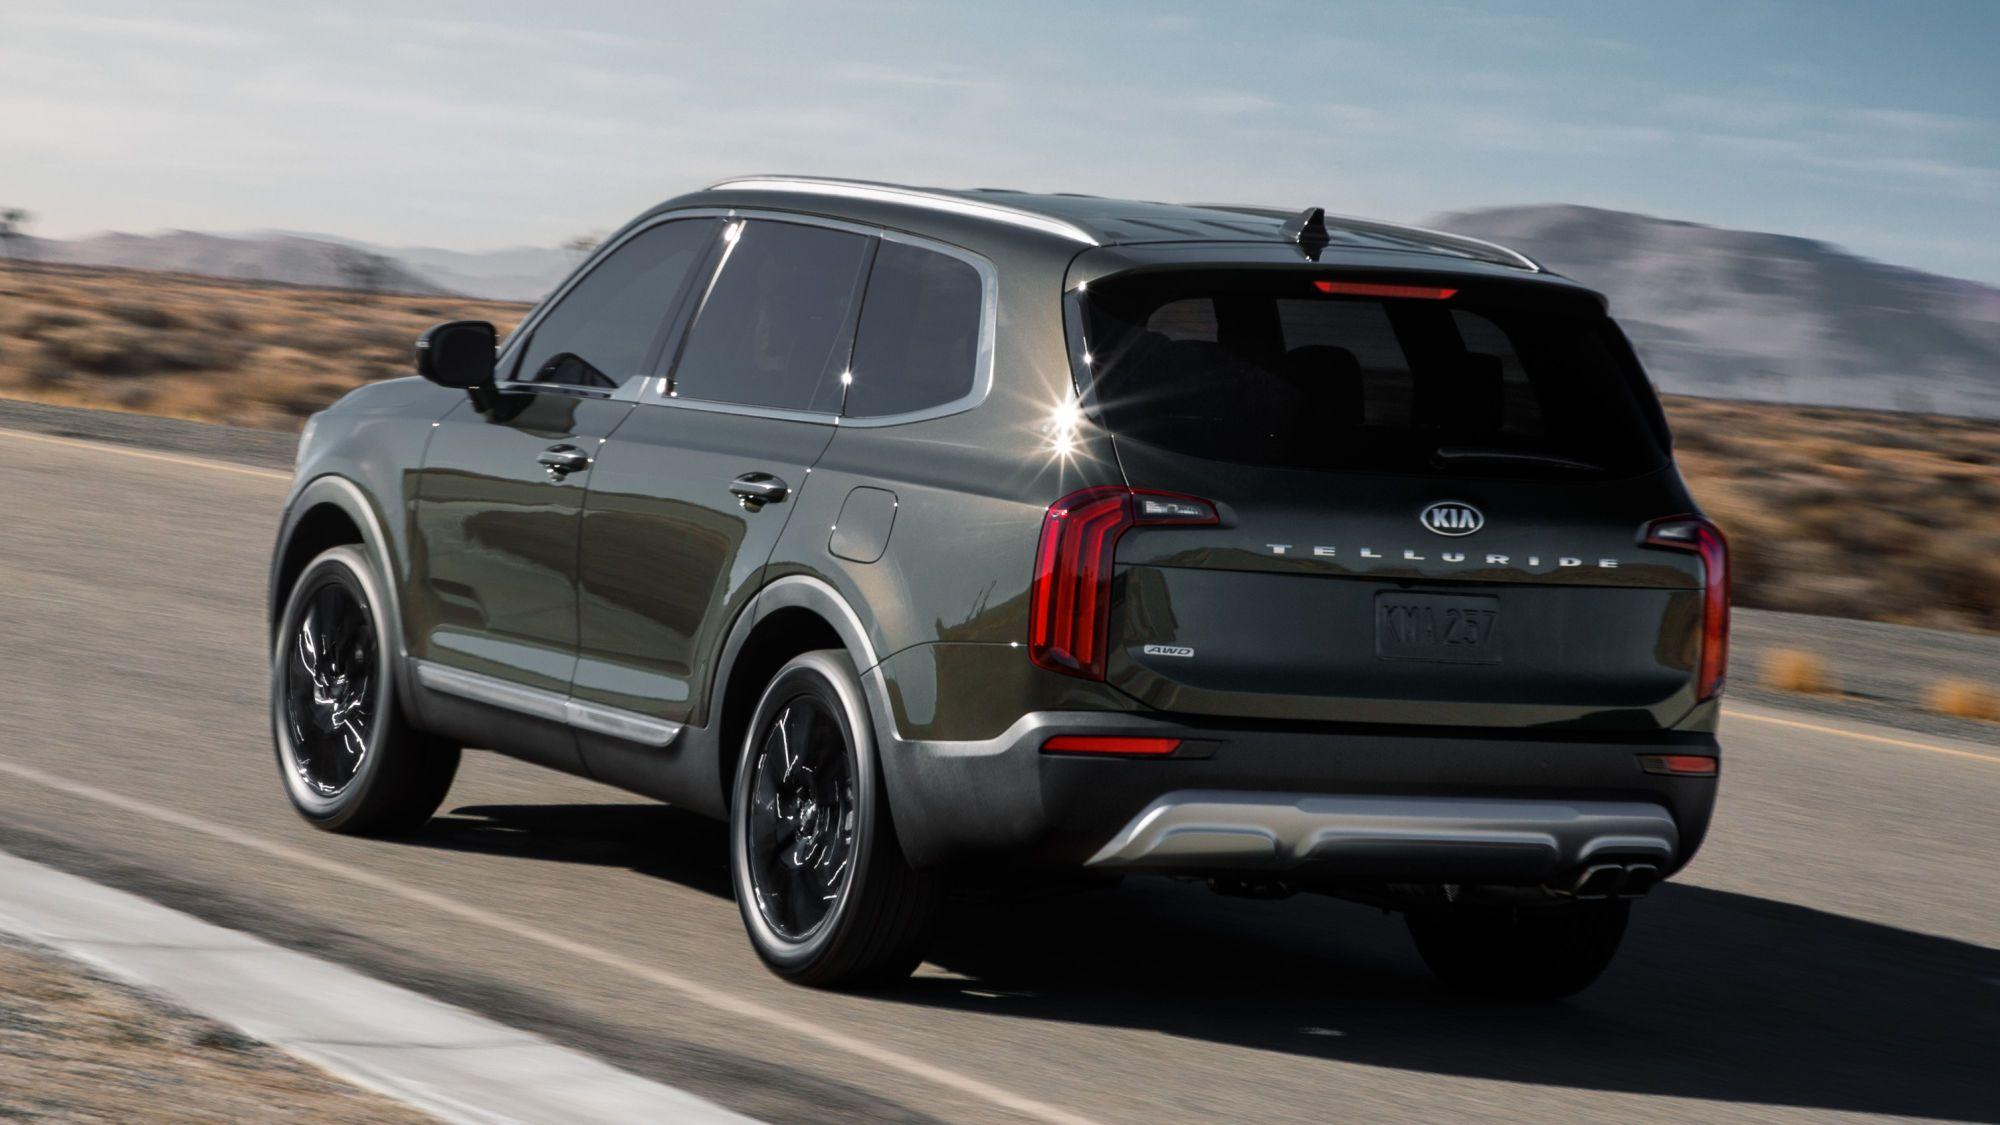 2020 Kia Telluride Reviews Best midsize suv, Suv cars